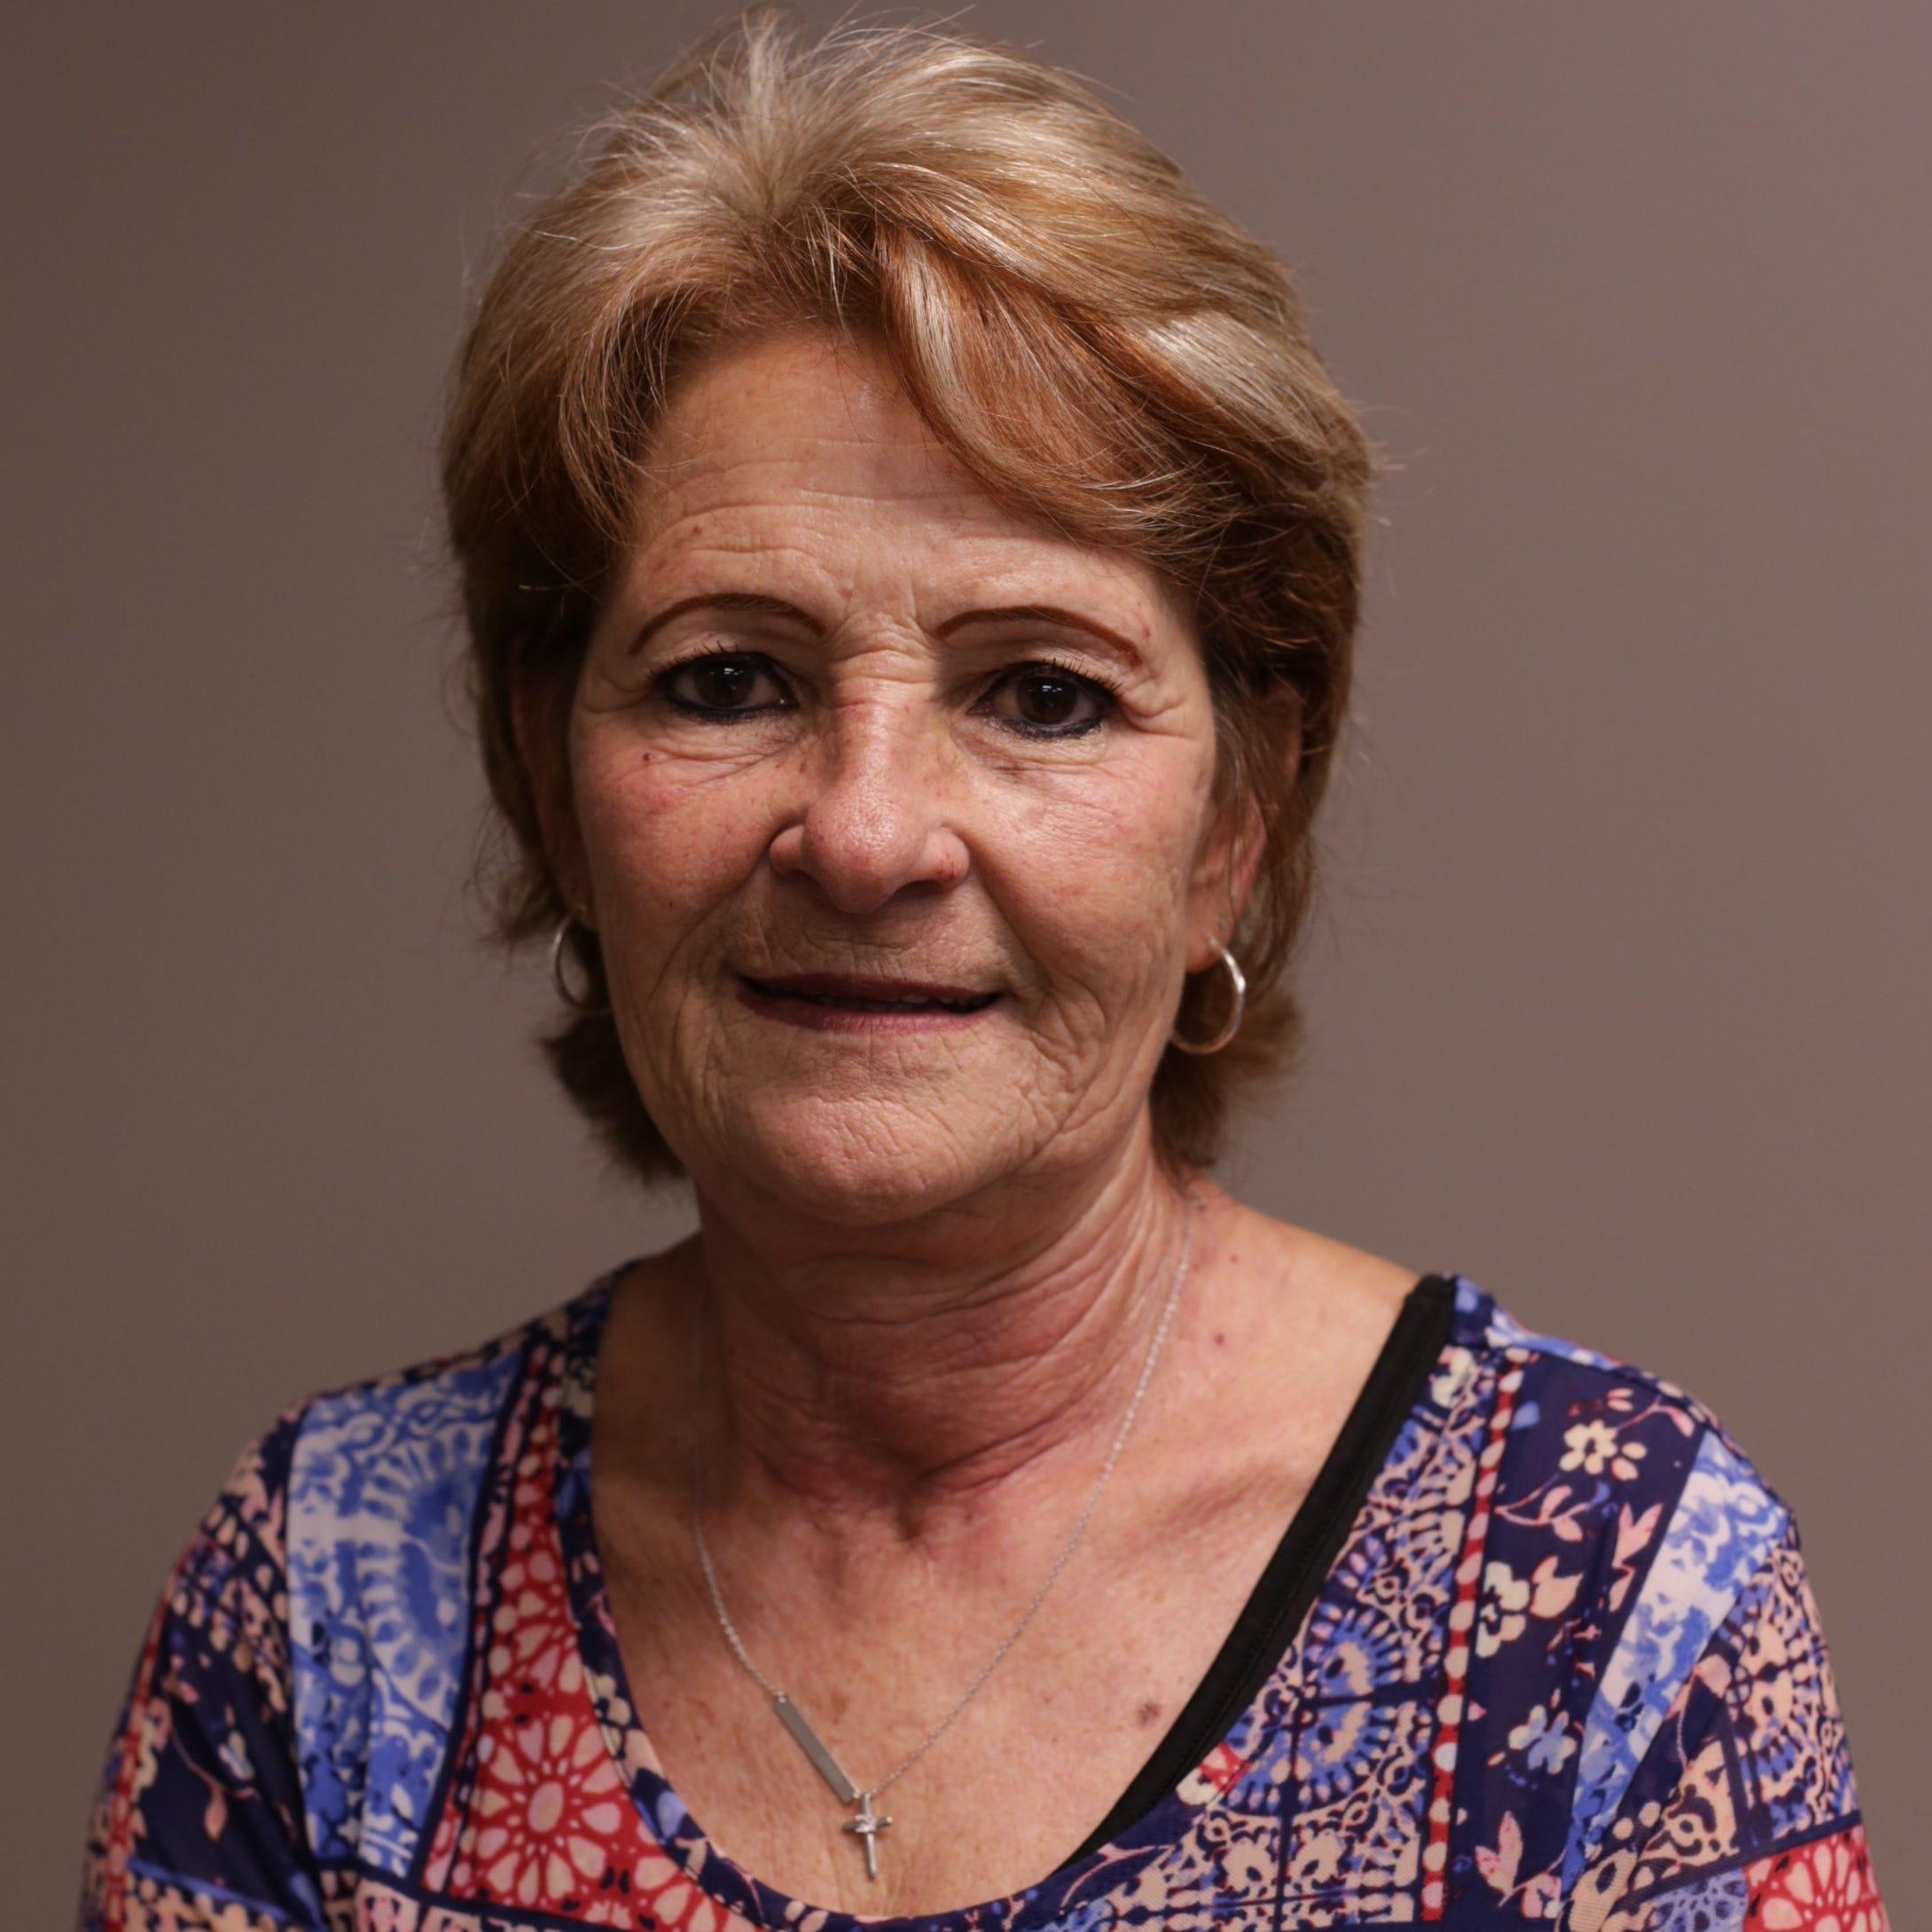 Q&A: Rapides Parish School Board candidate Pam Burlew